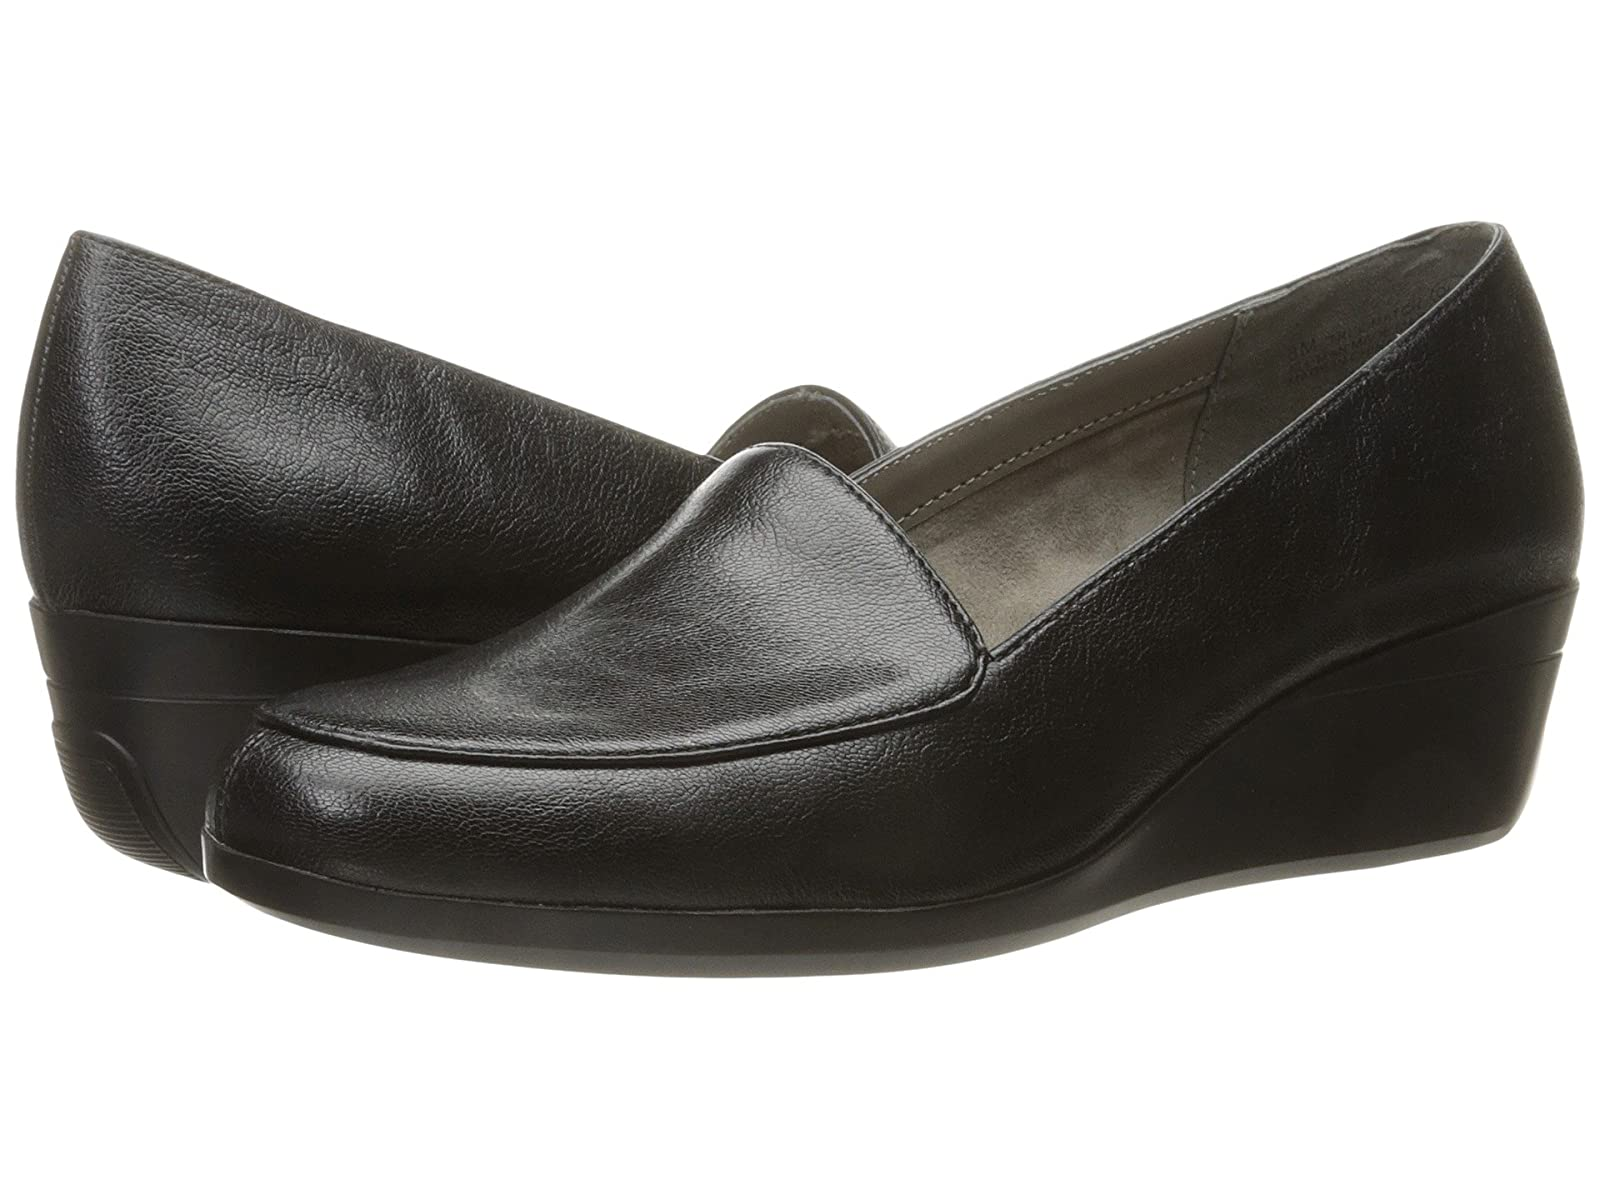 Aerosoles True MatchCheap and distinctive eye-catching shoes